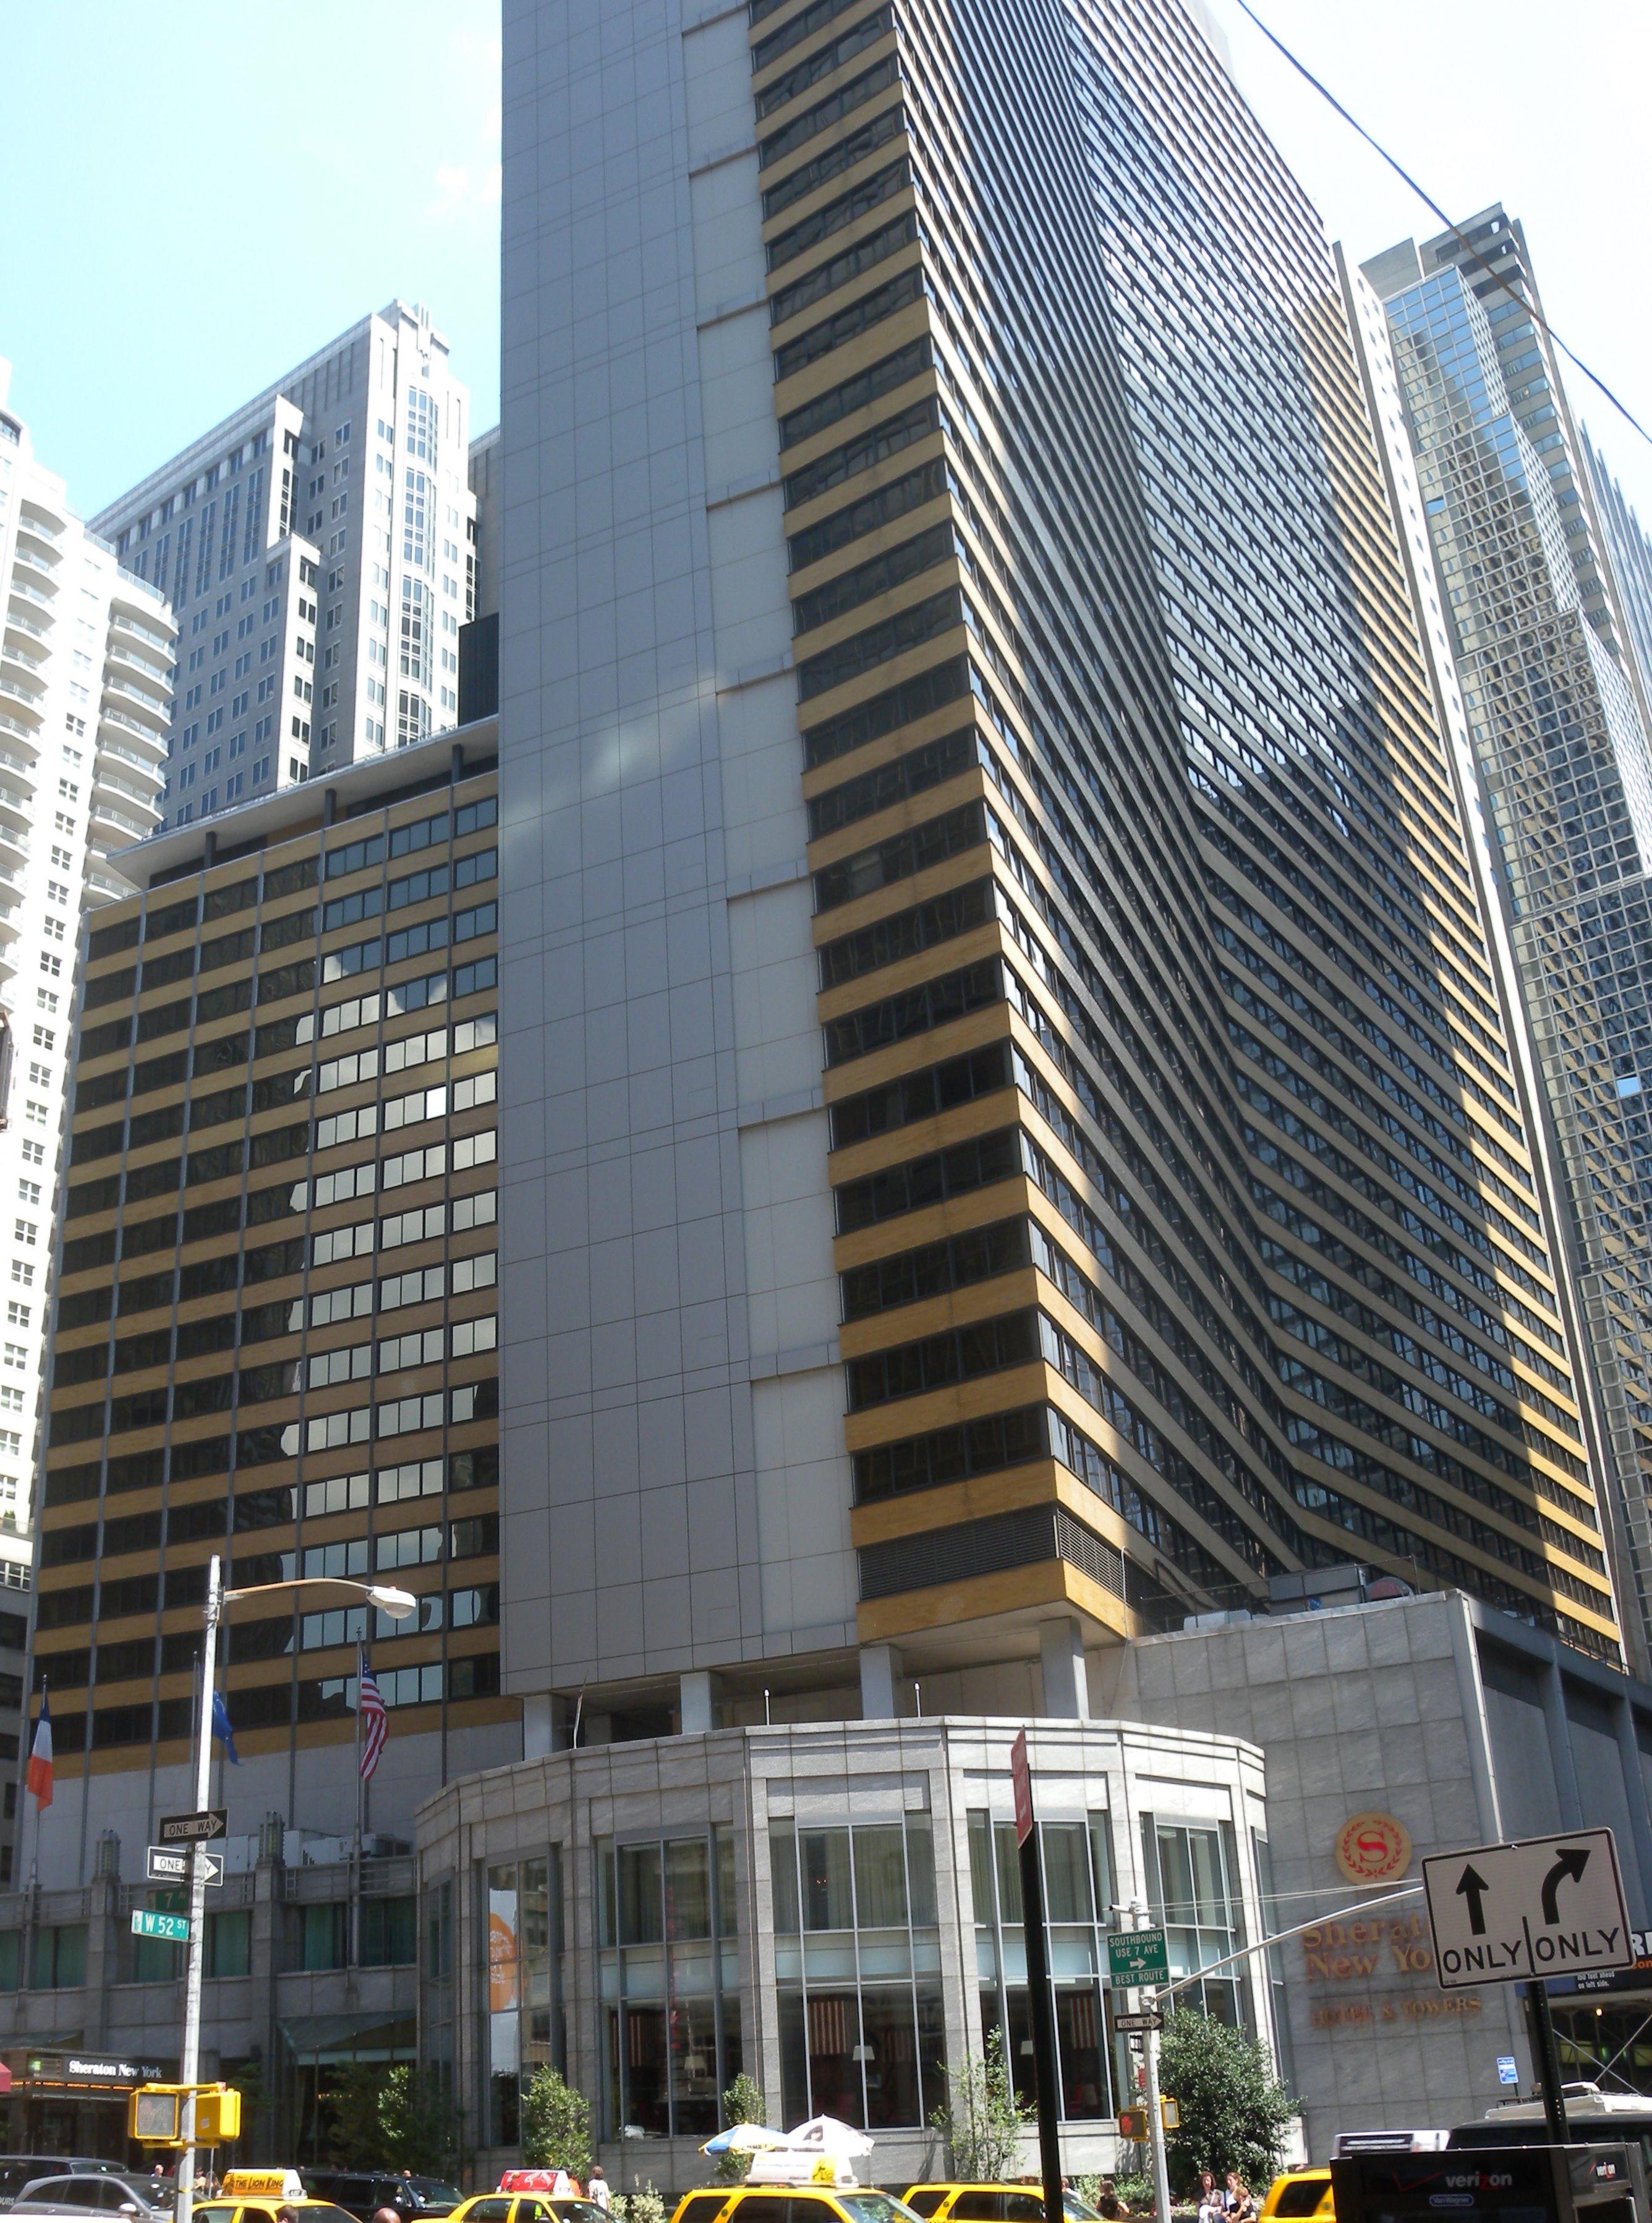 Westin Hotel Times Square Restaurant